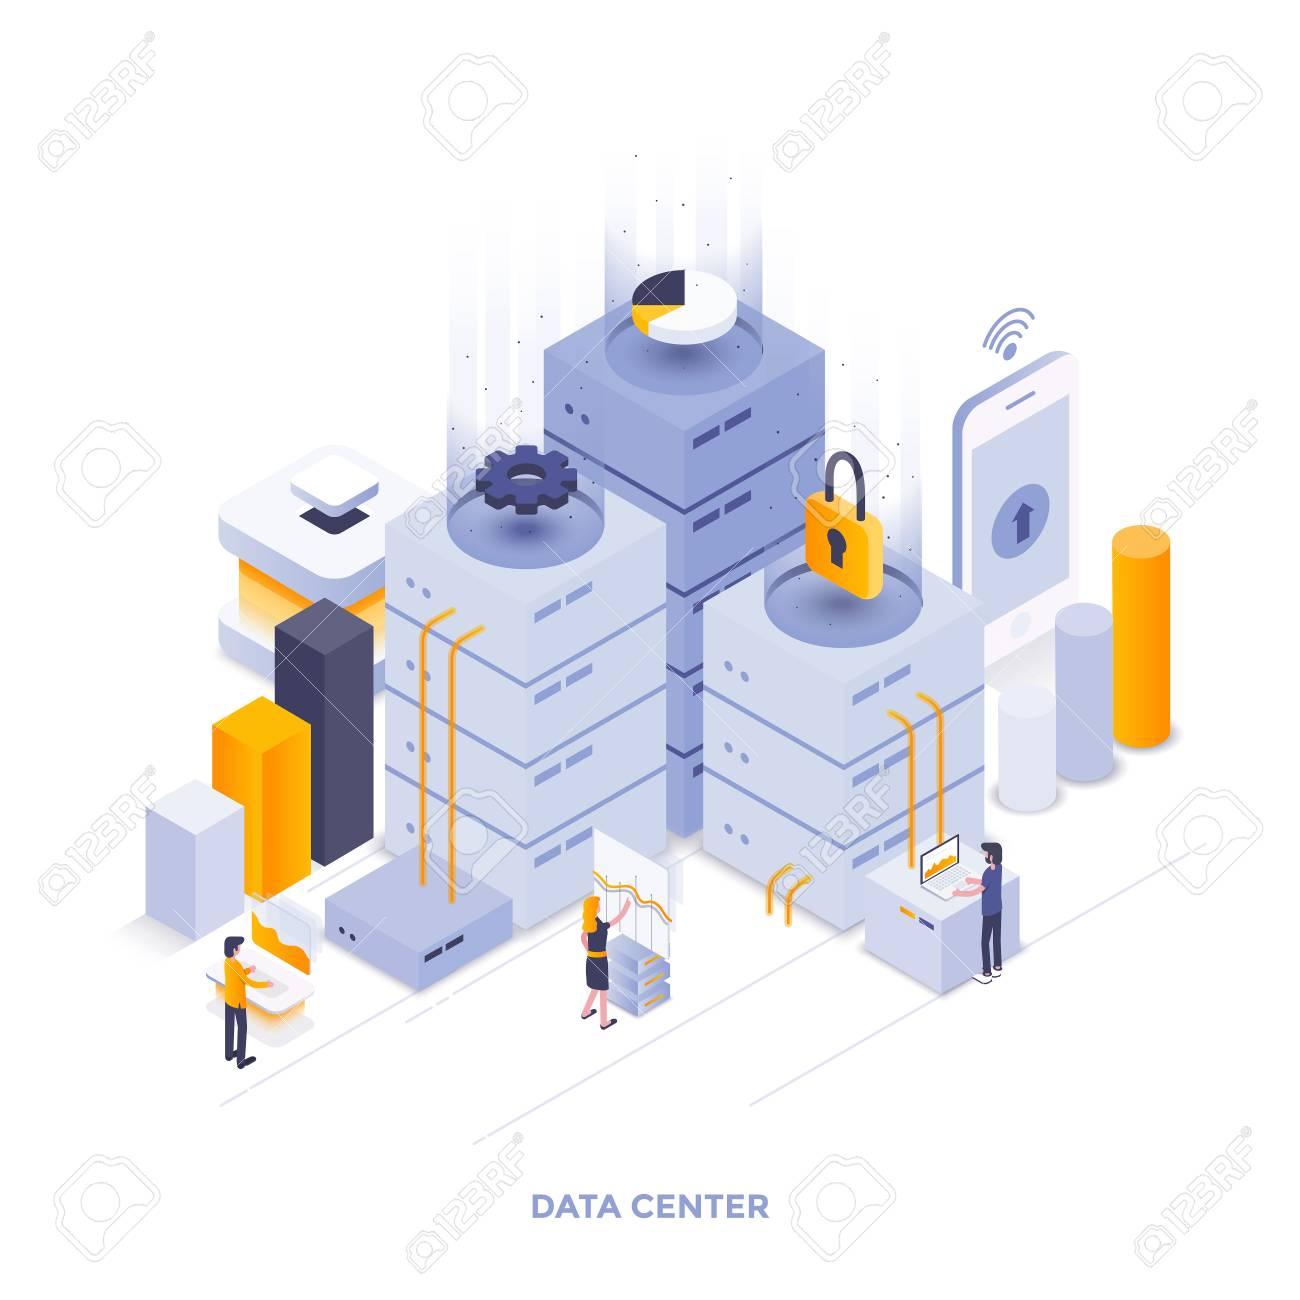 Modern flat design isometric illustration of Data Center  Can